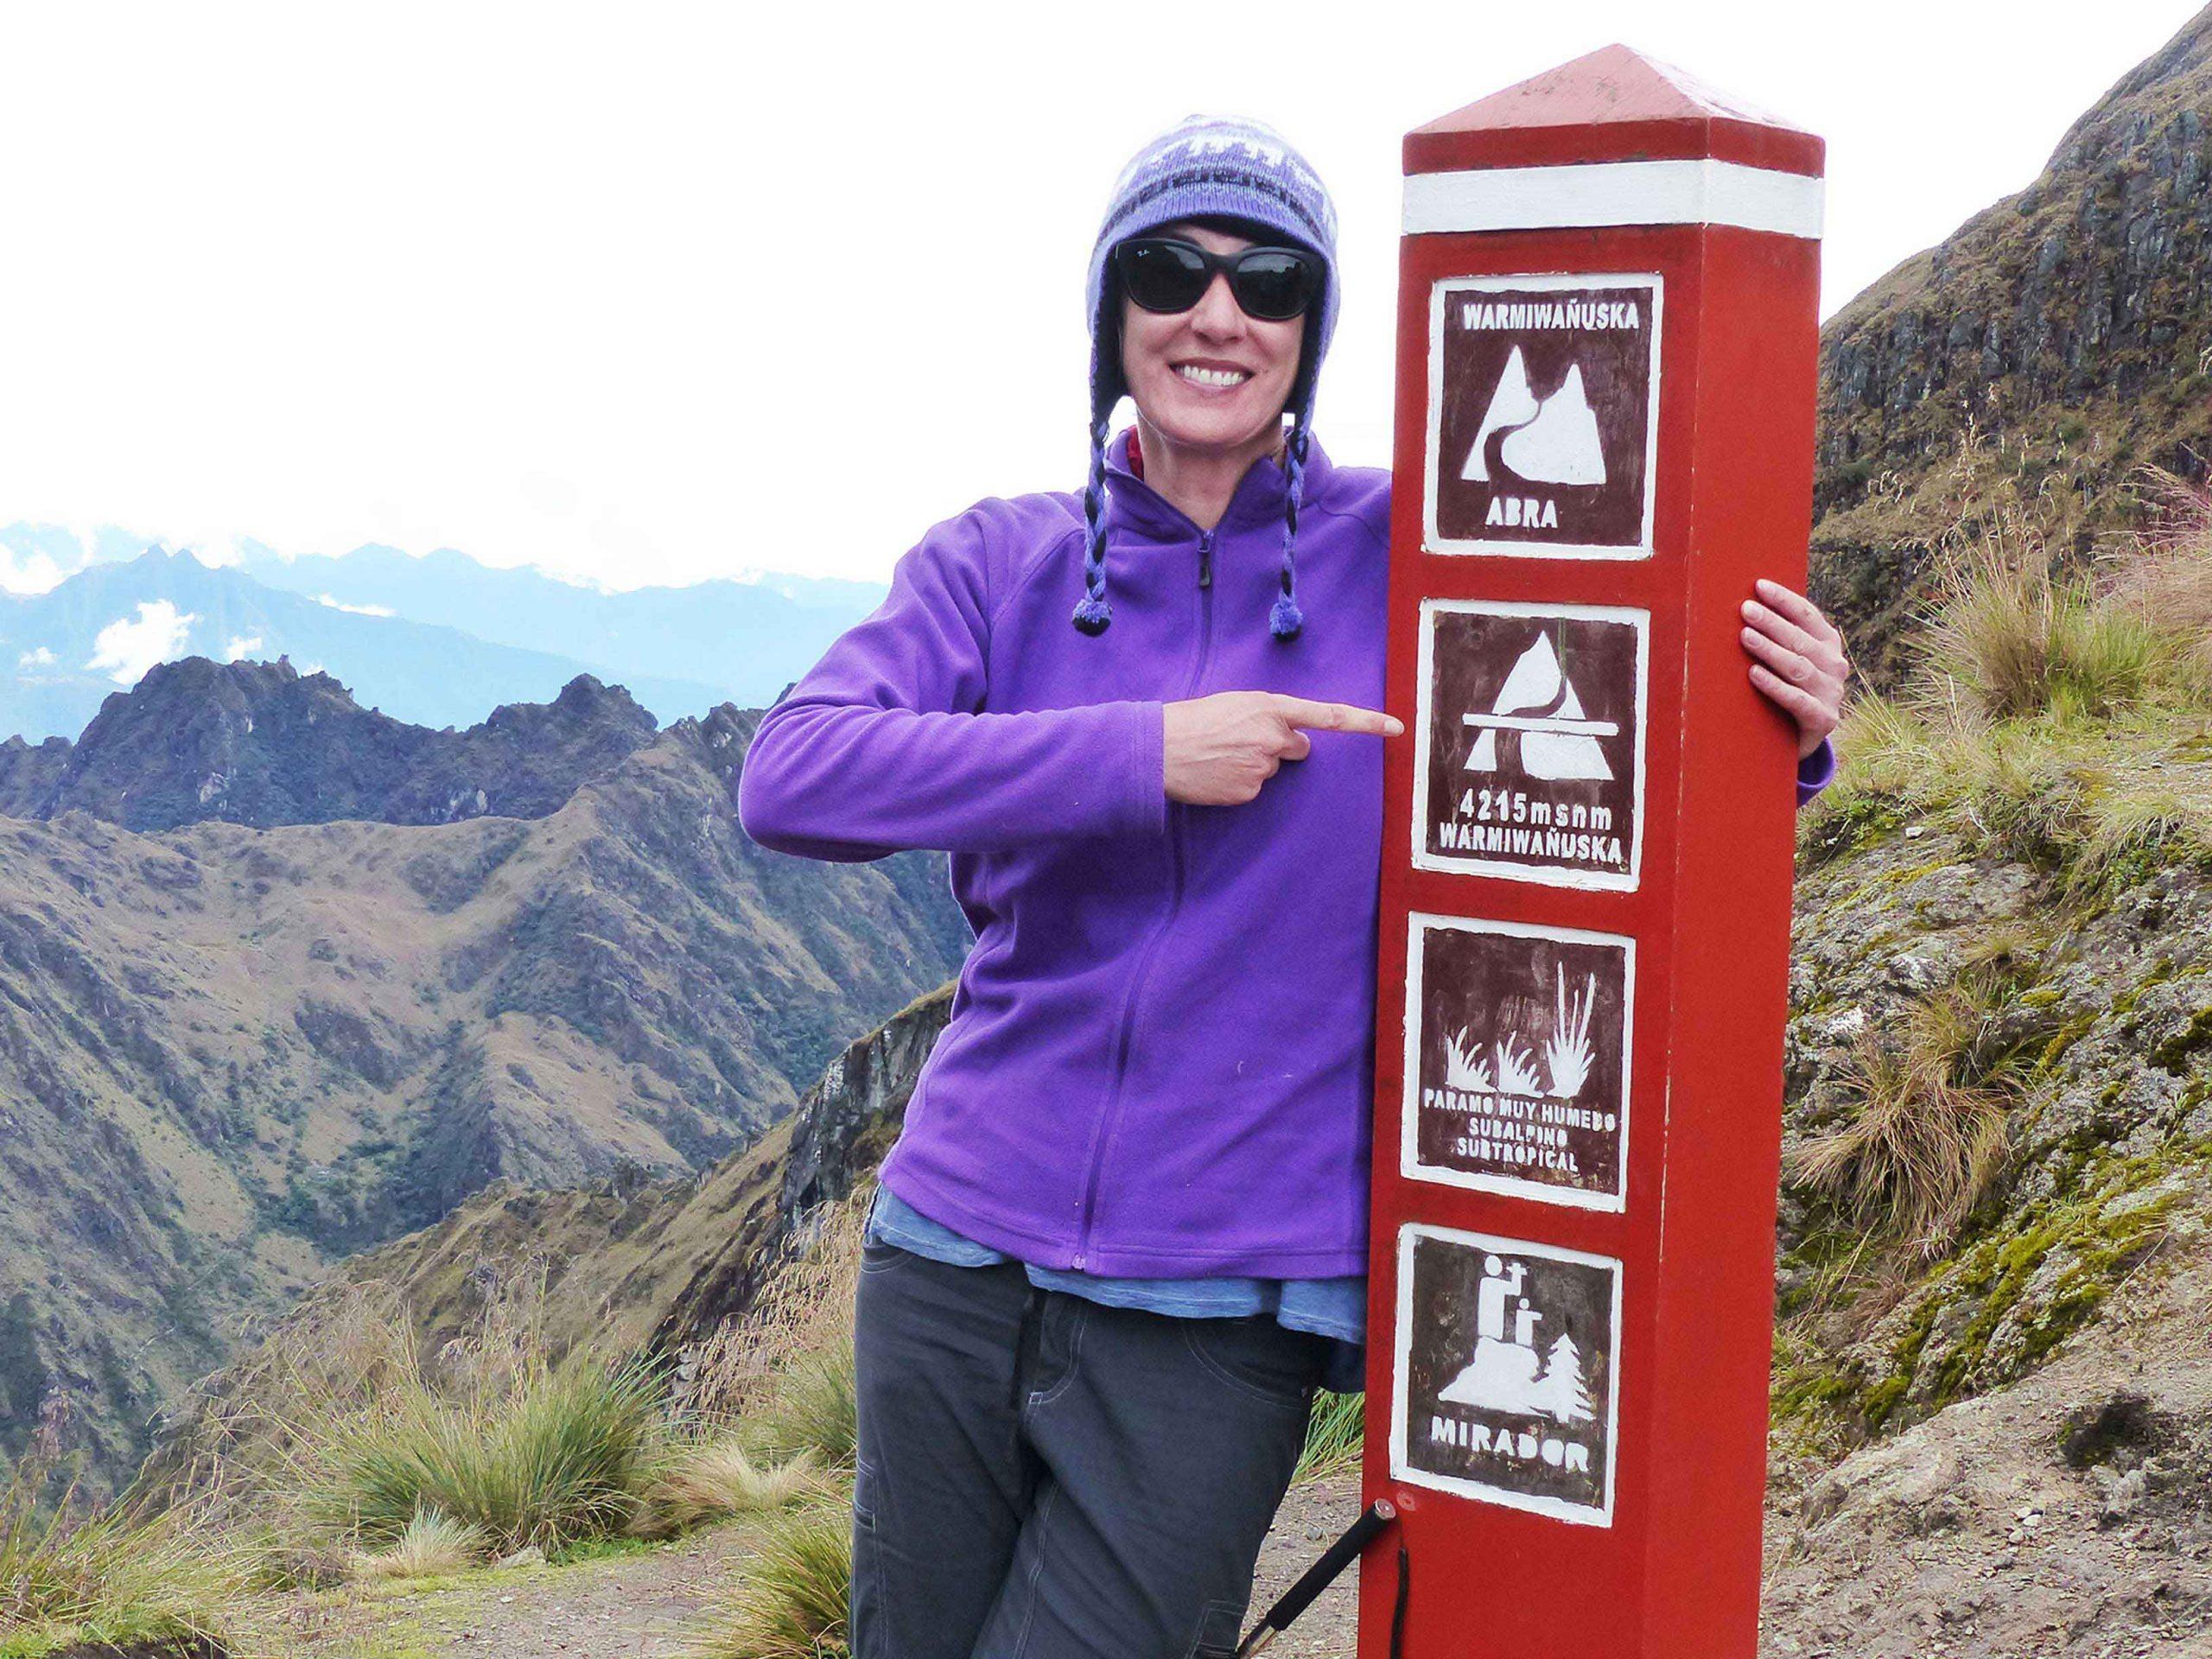 SueWhereWhyWhat Hiking the Inca Trail